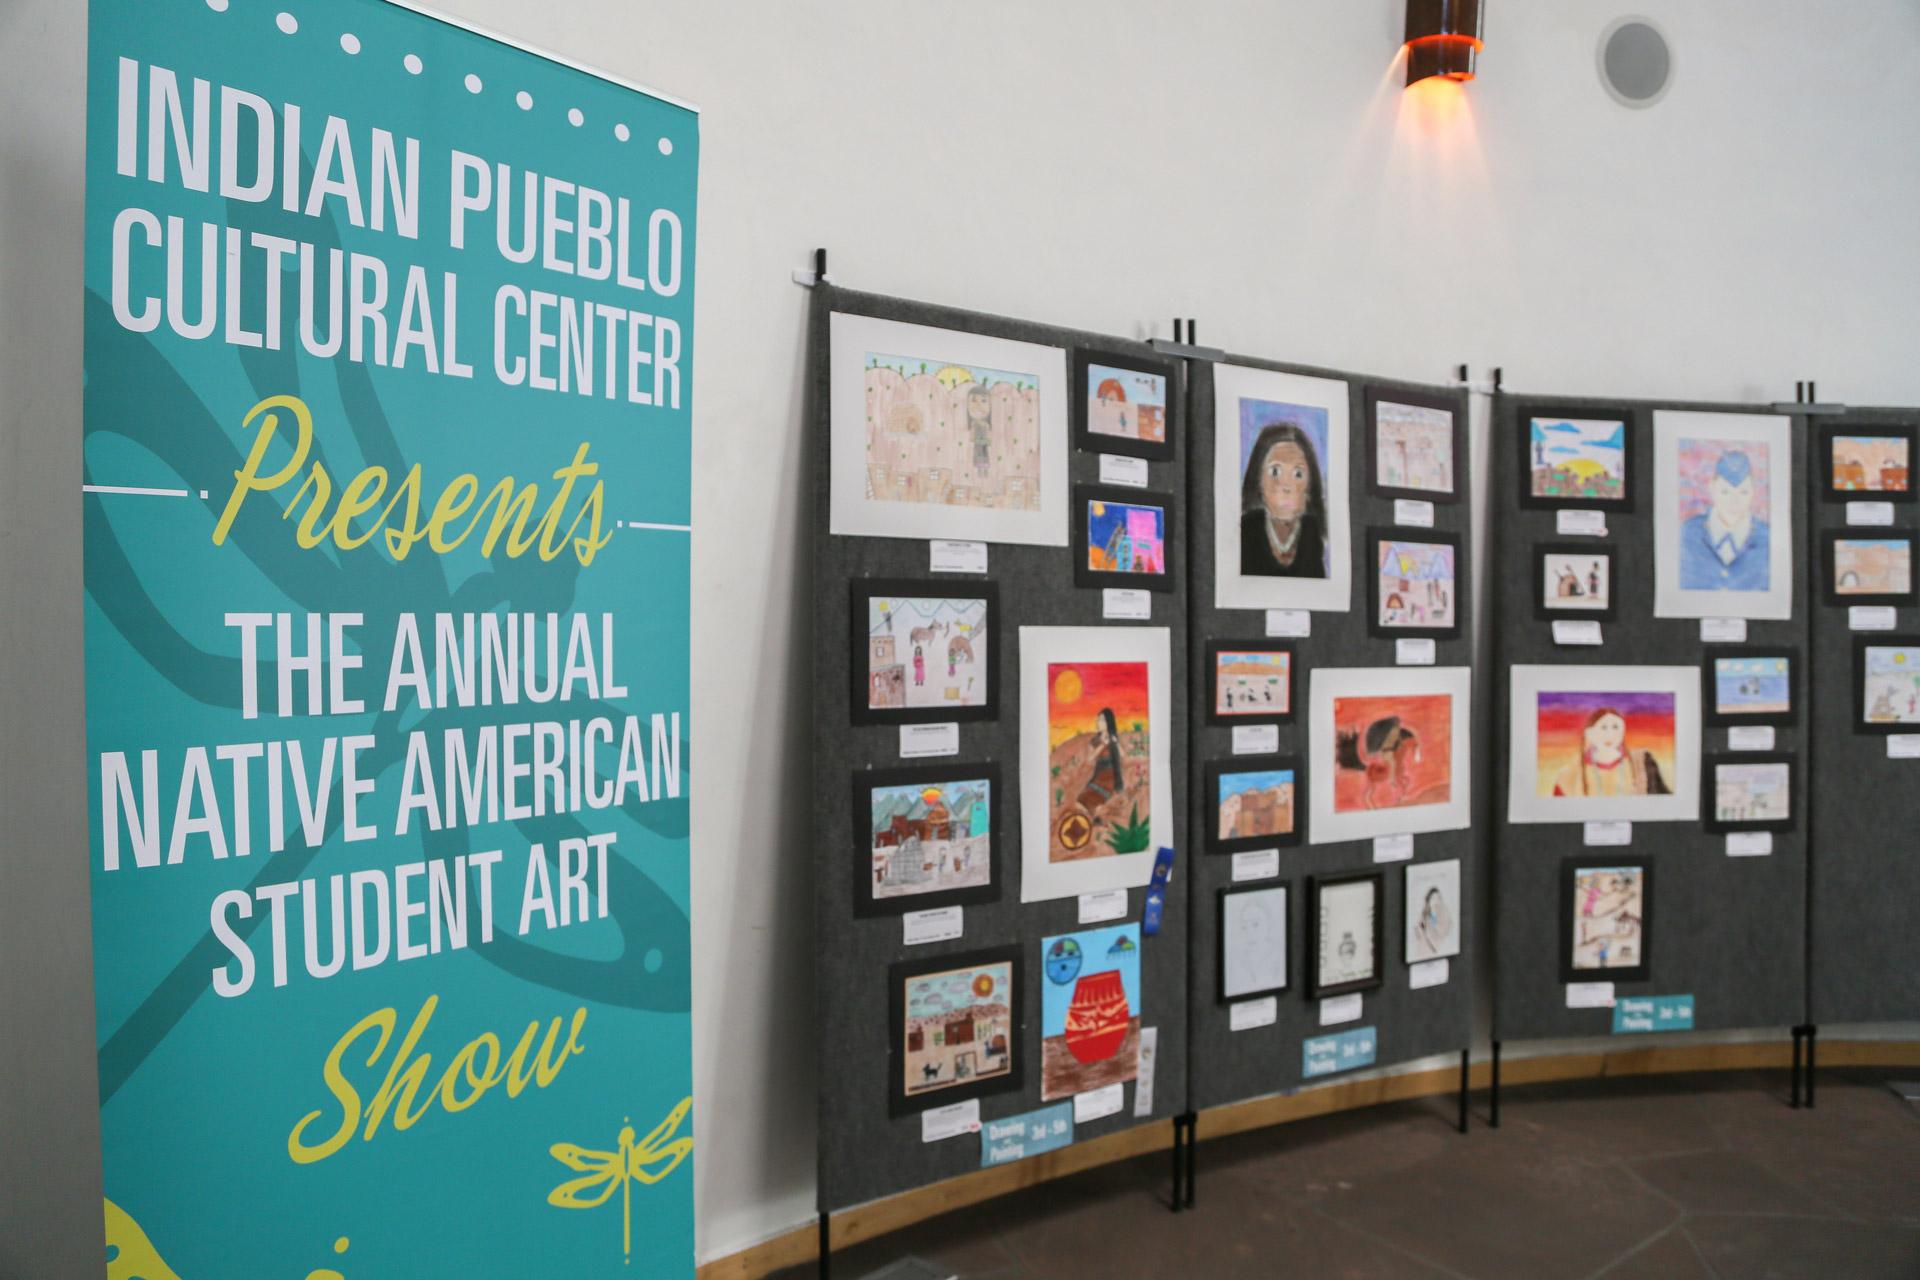 Native American Student Art Show